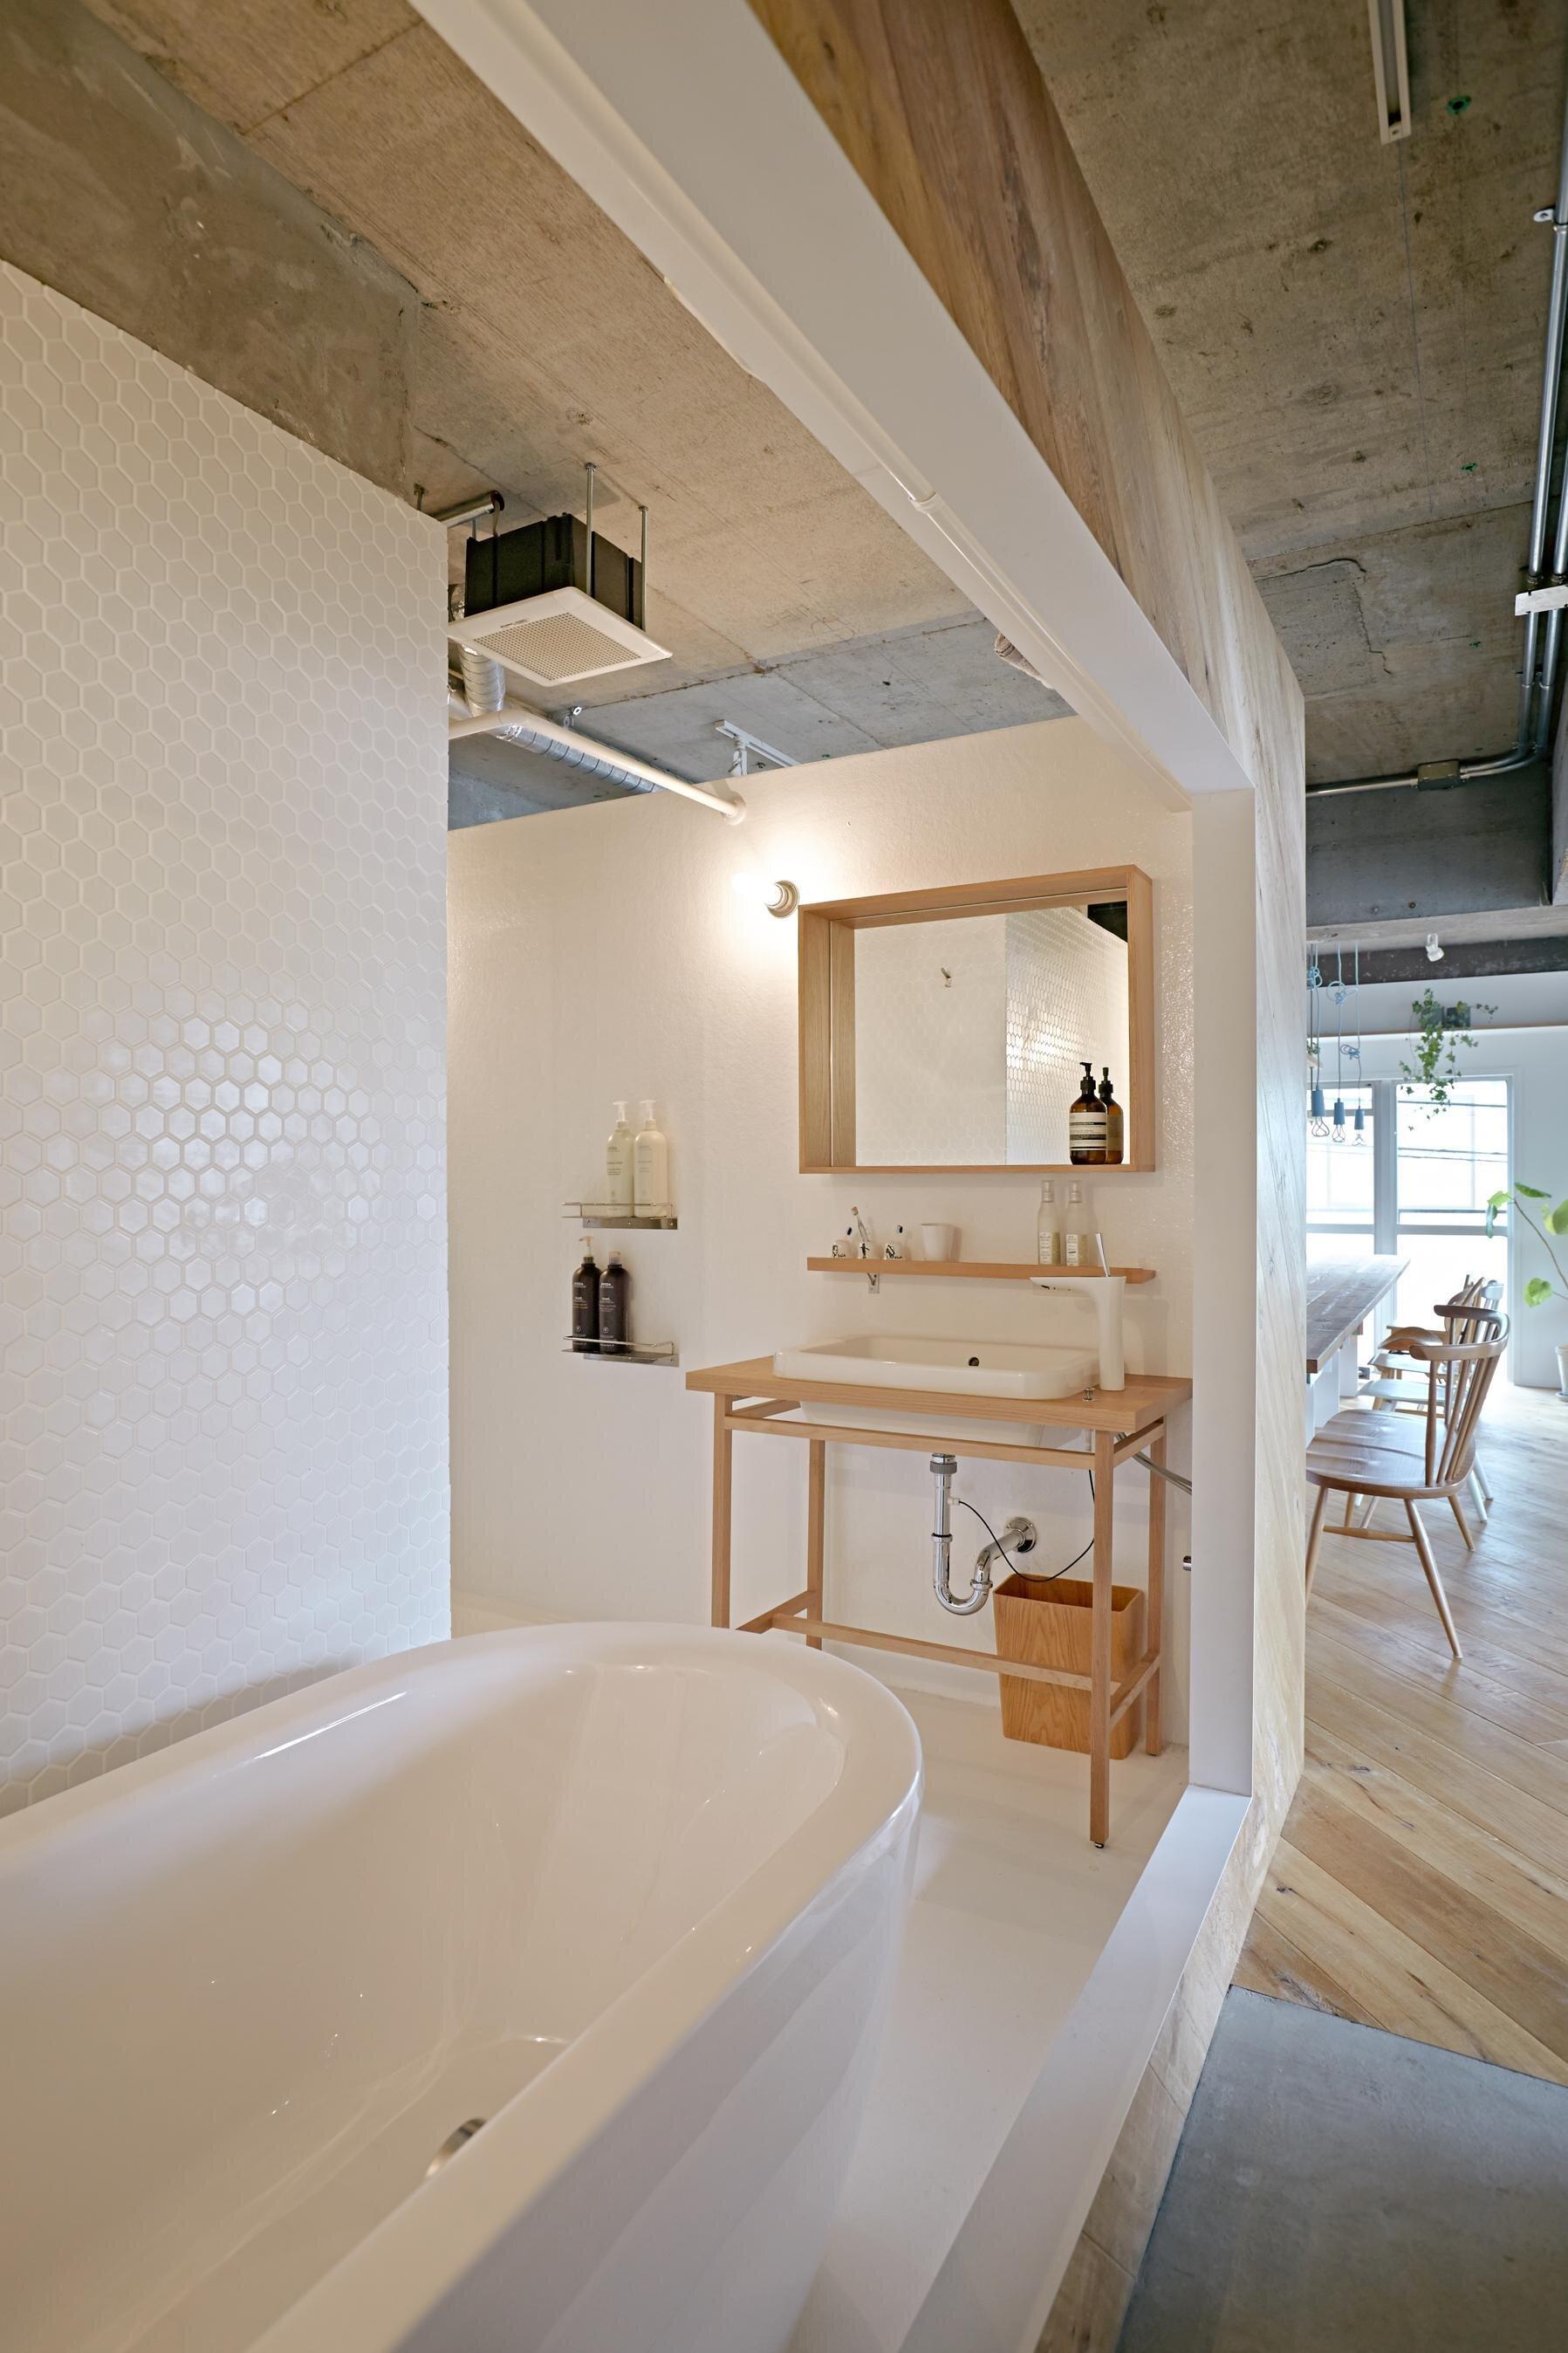 Tenhachi House - .8 Tenhachi Architect & Interior Design - Tokyo - Bathroom - Humble Homes